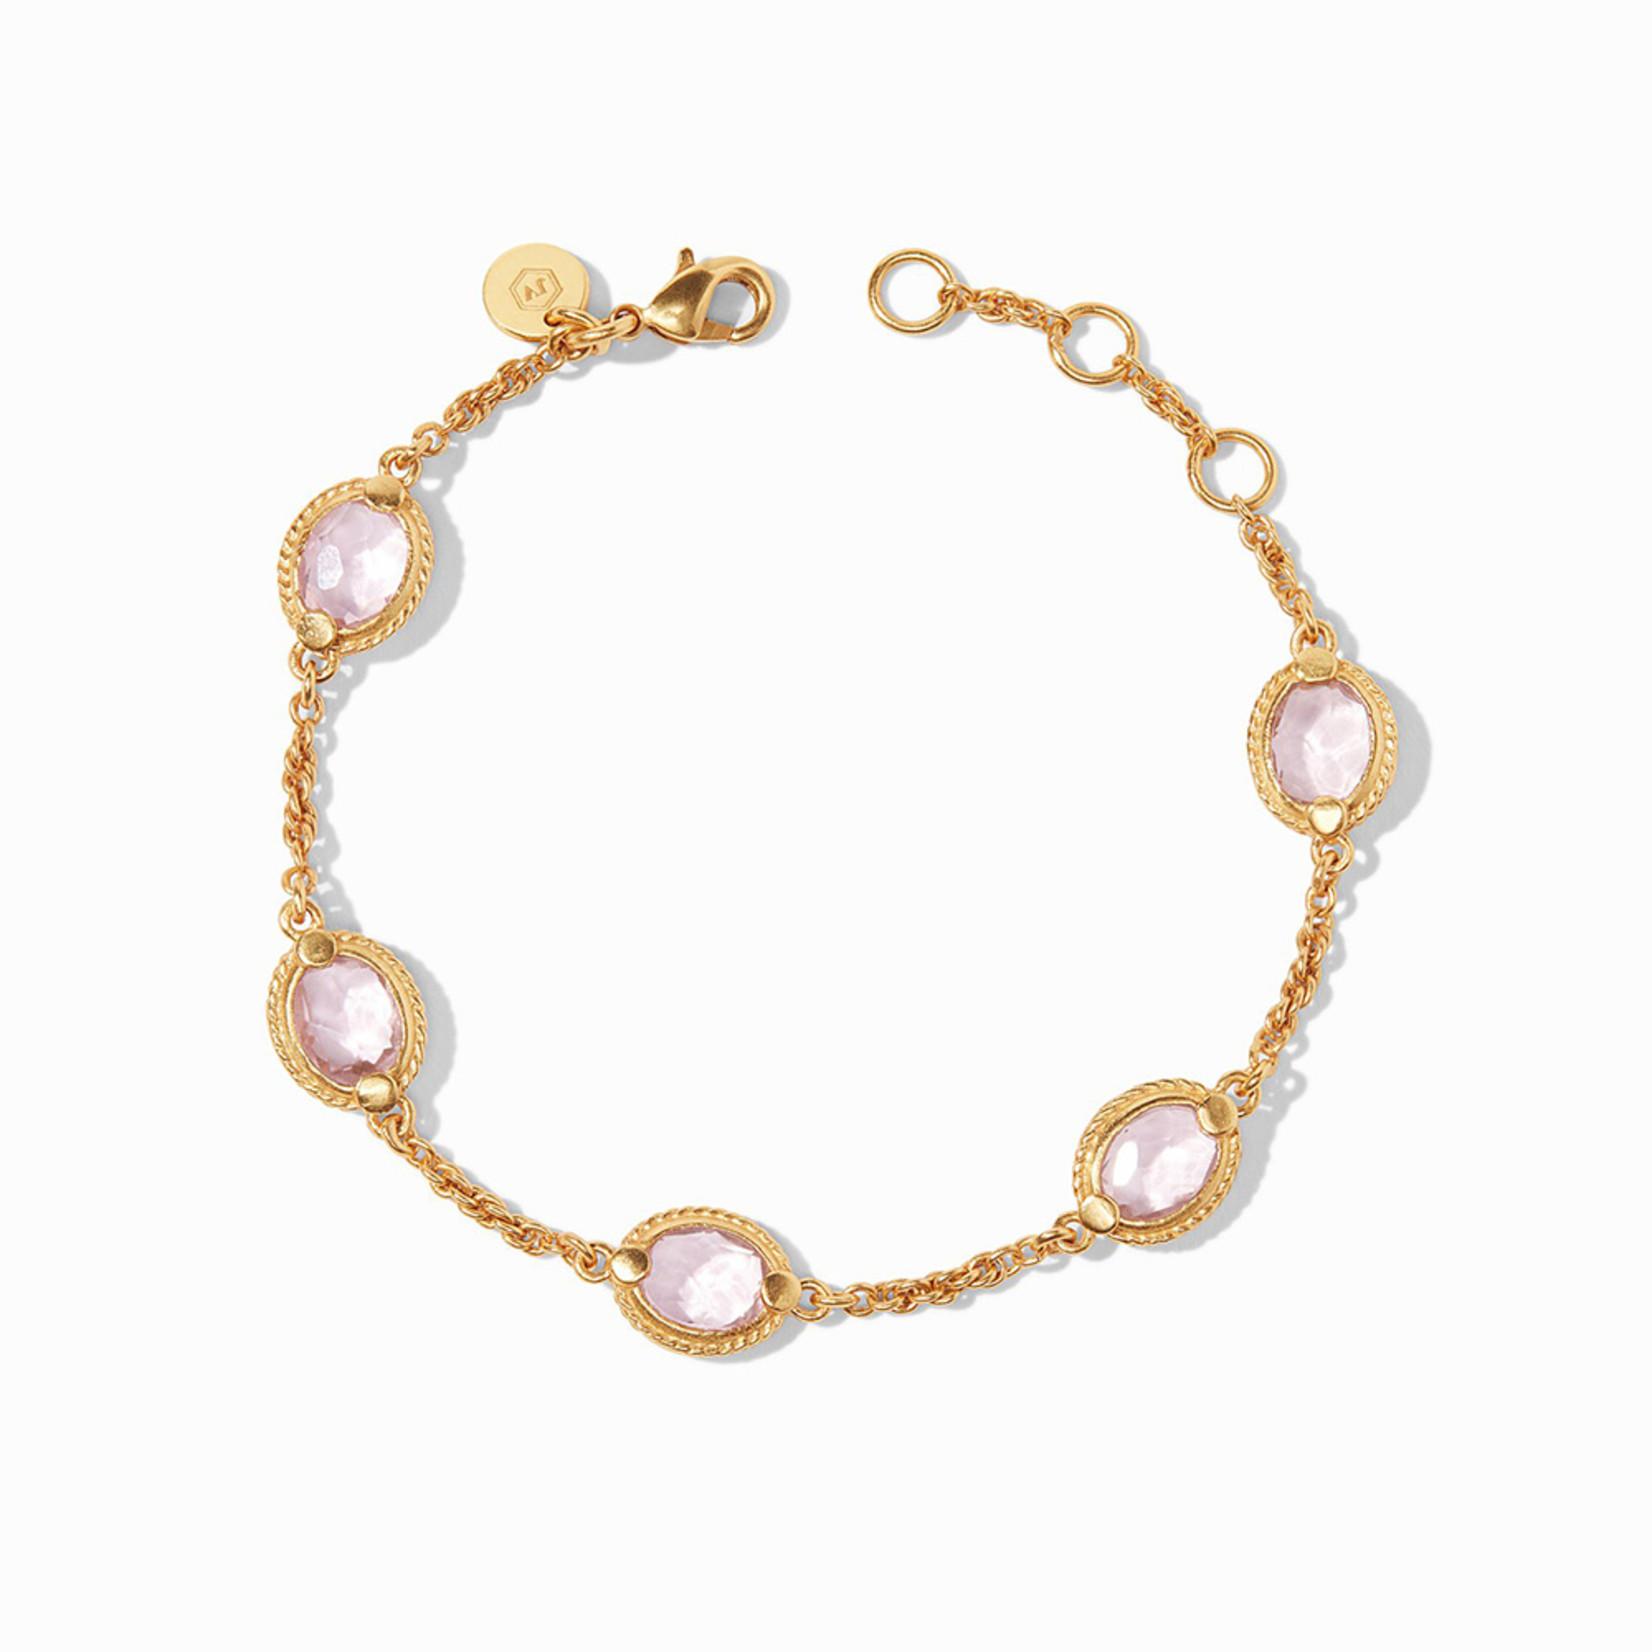 Julie Vos Calypso Delicate Bracelet